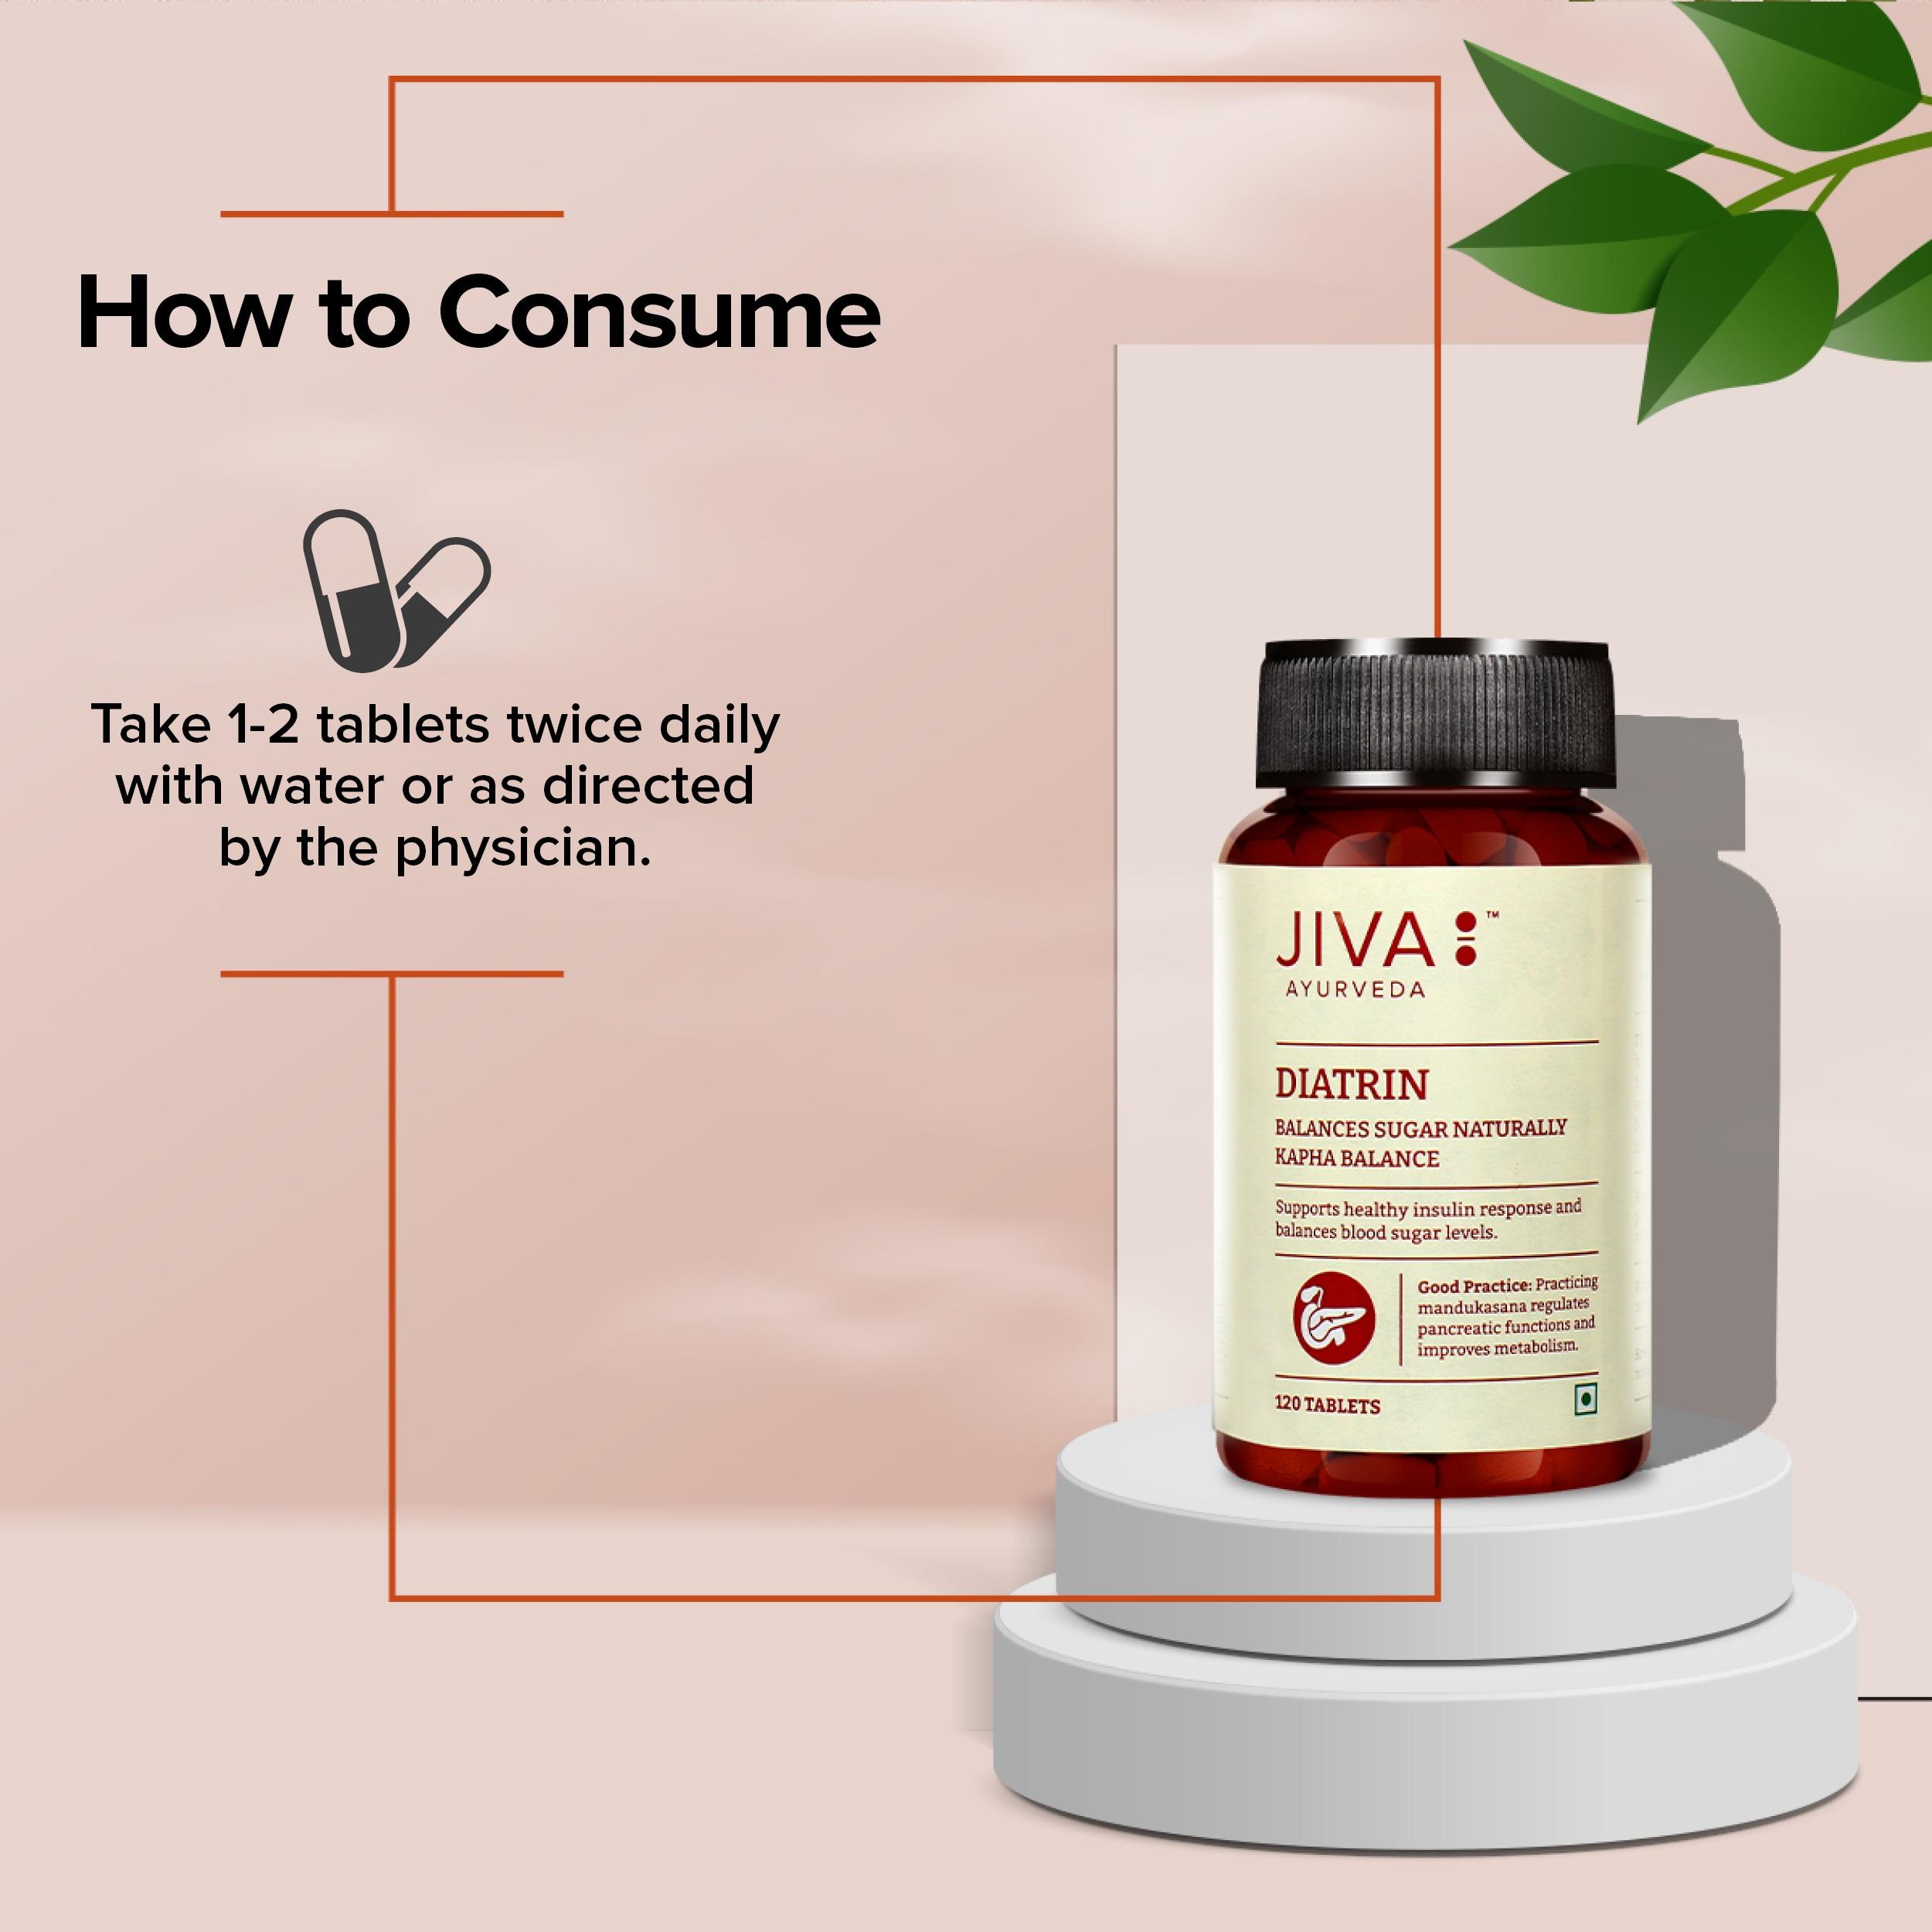 Jiva Store - Diatrin-How to Consume